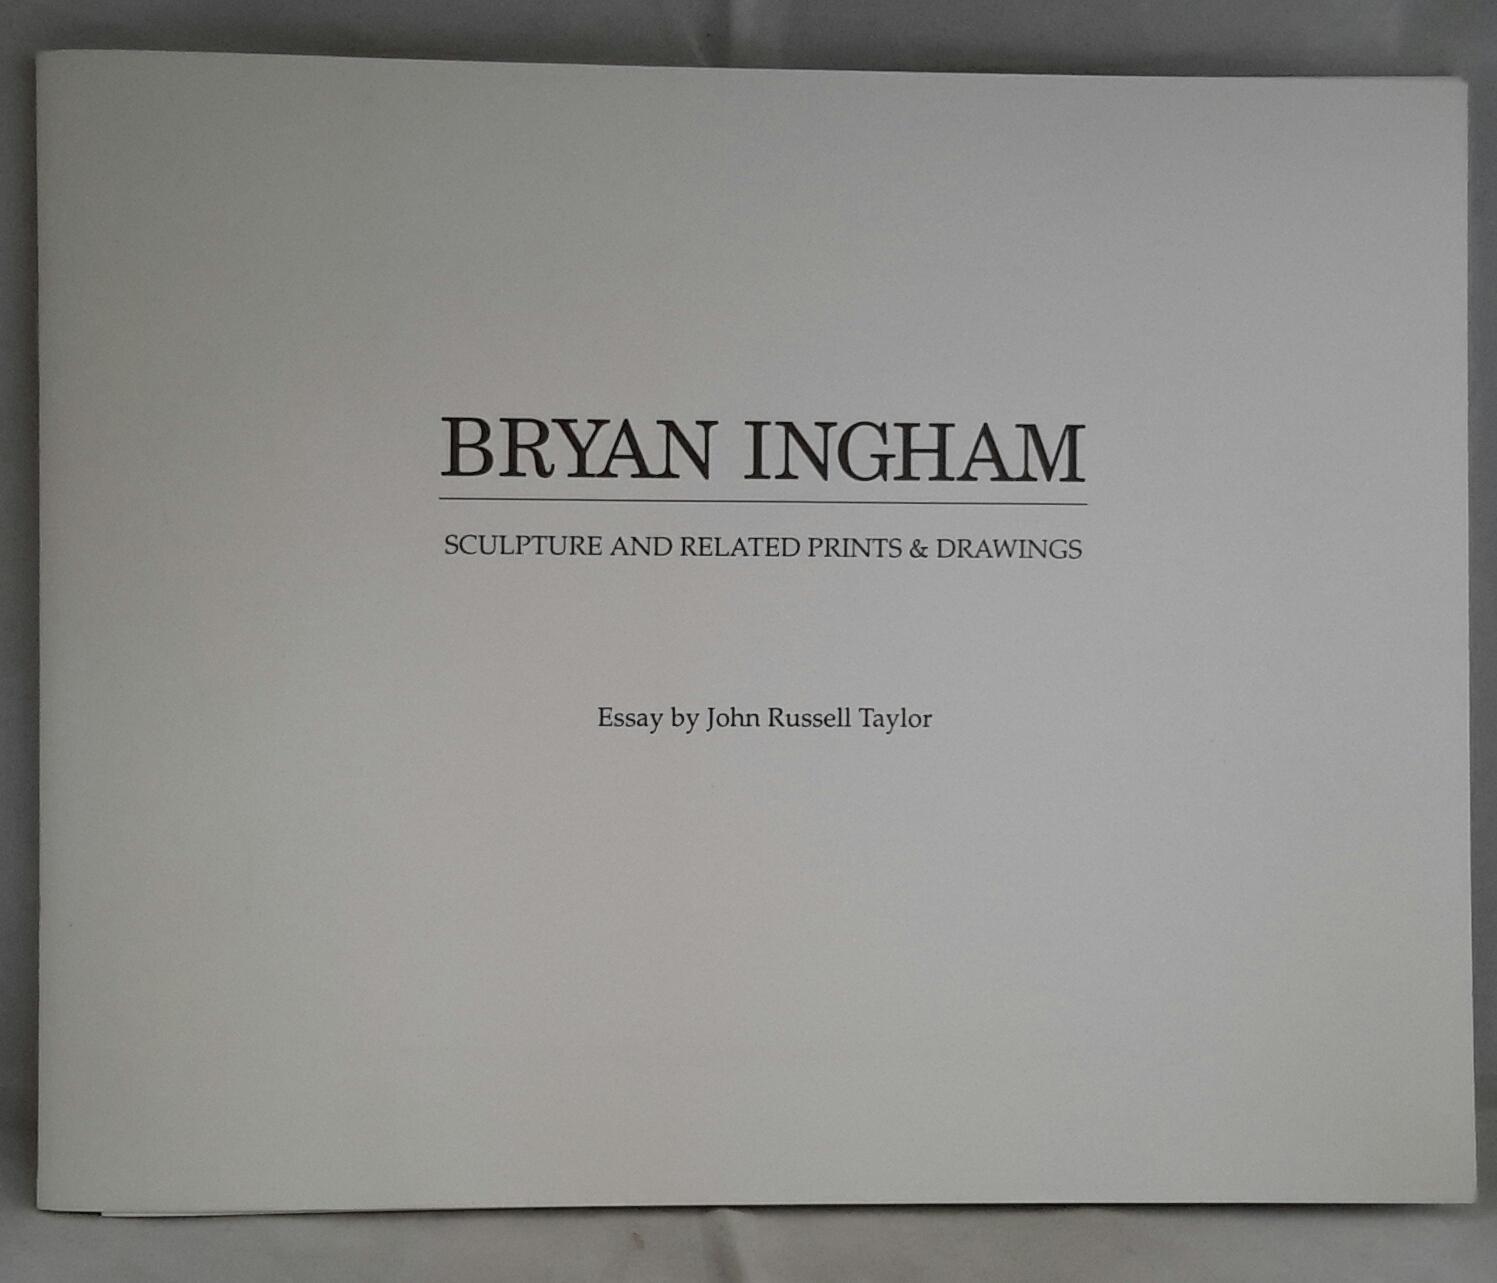 Books by William Jennings Bryan